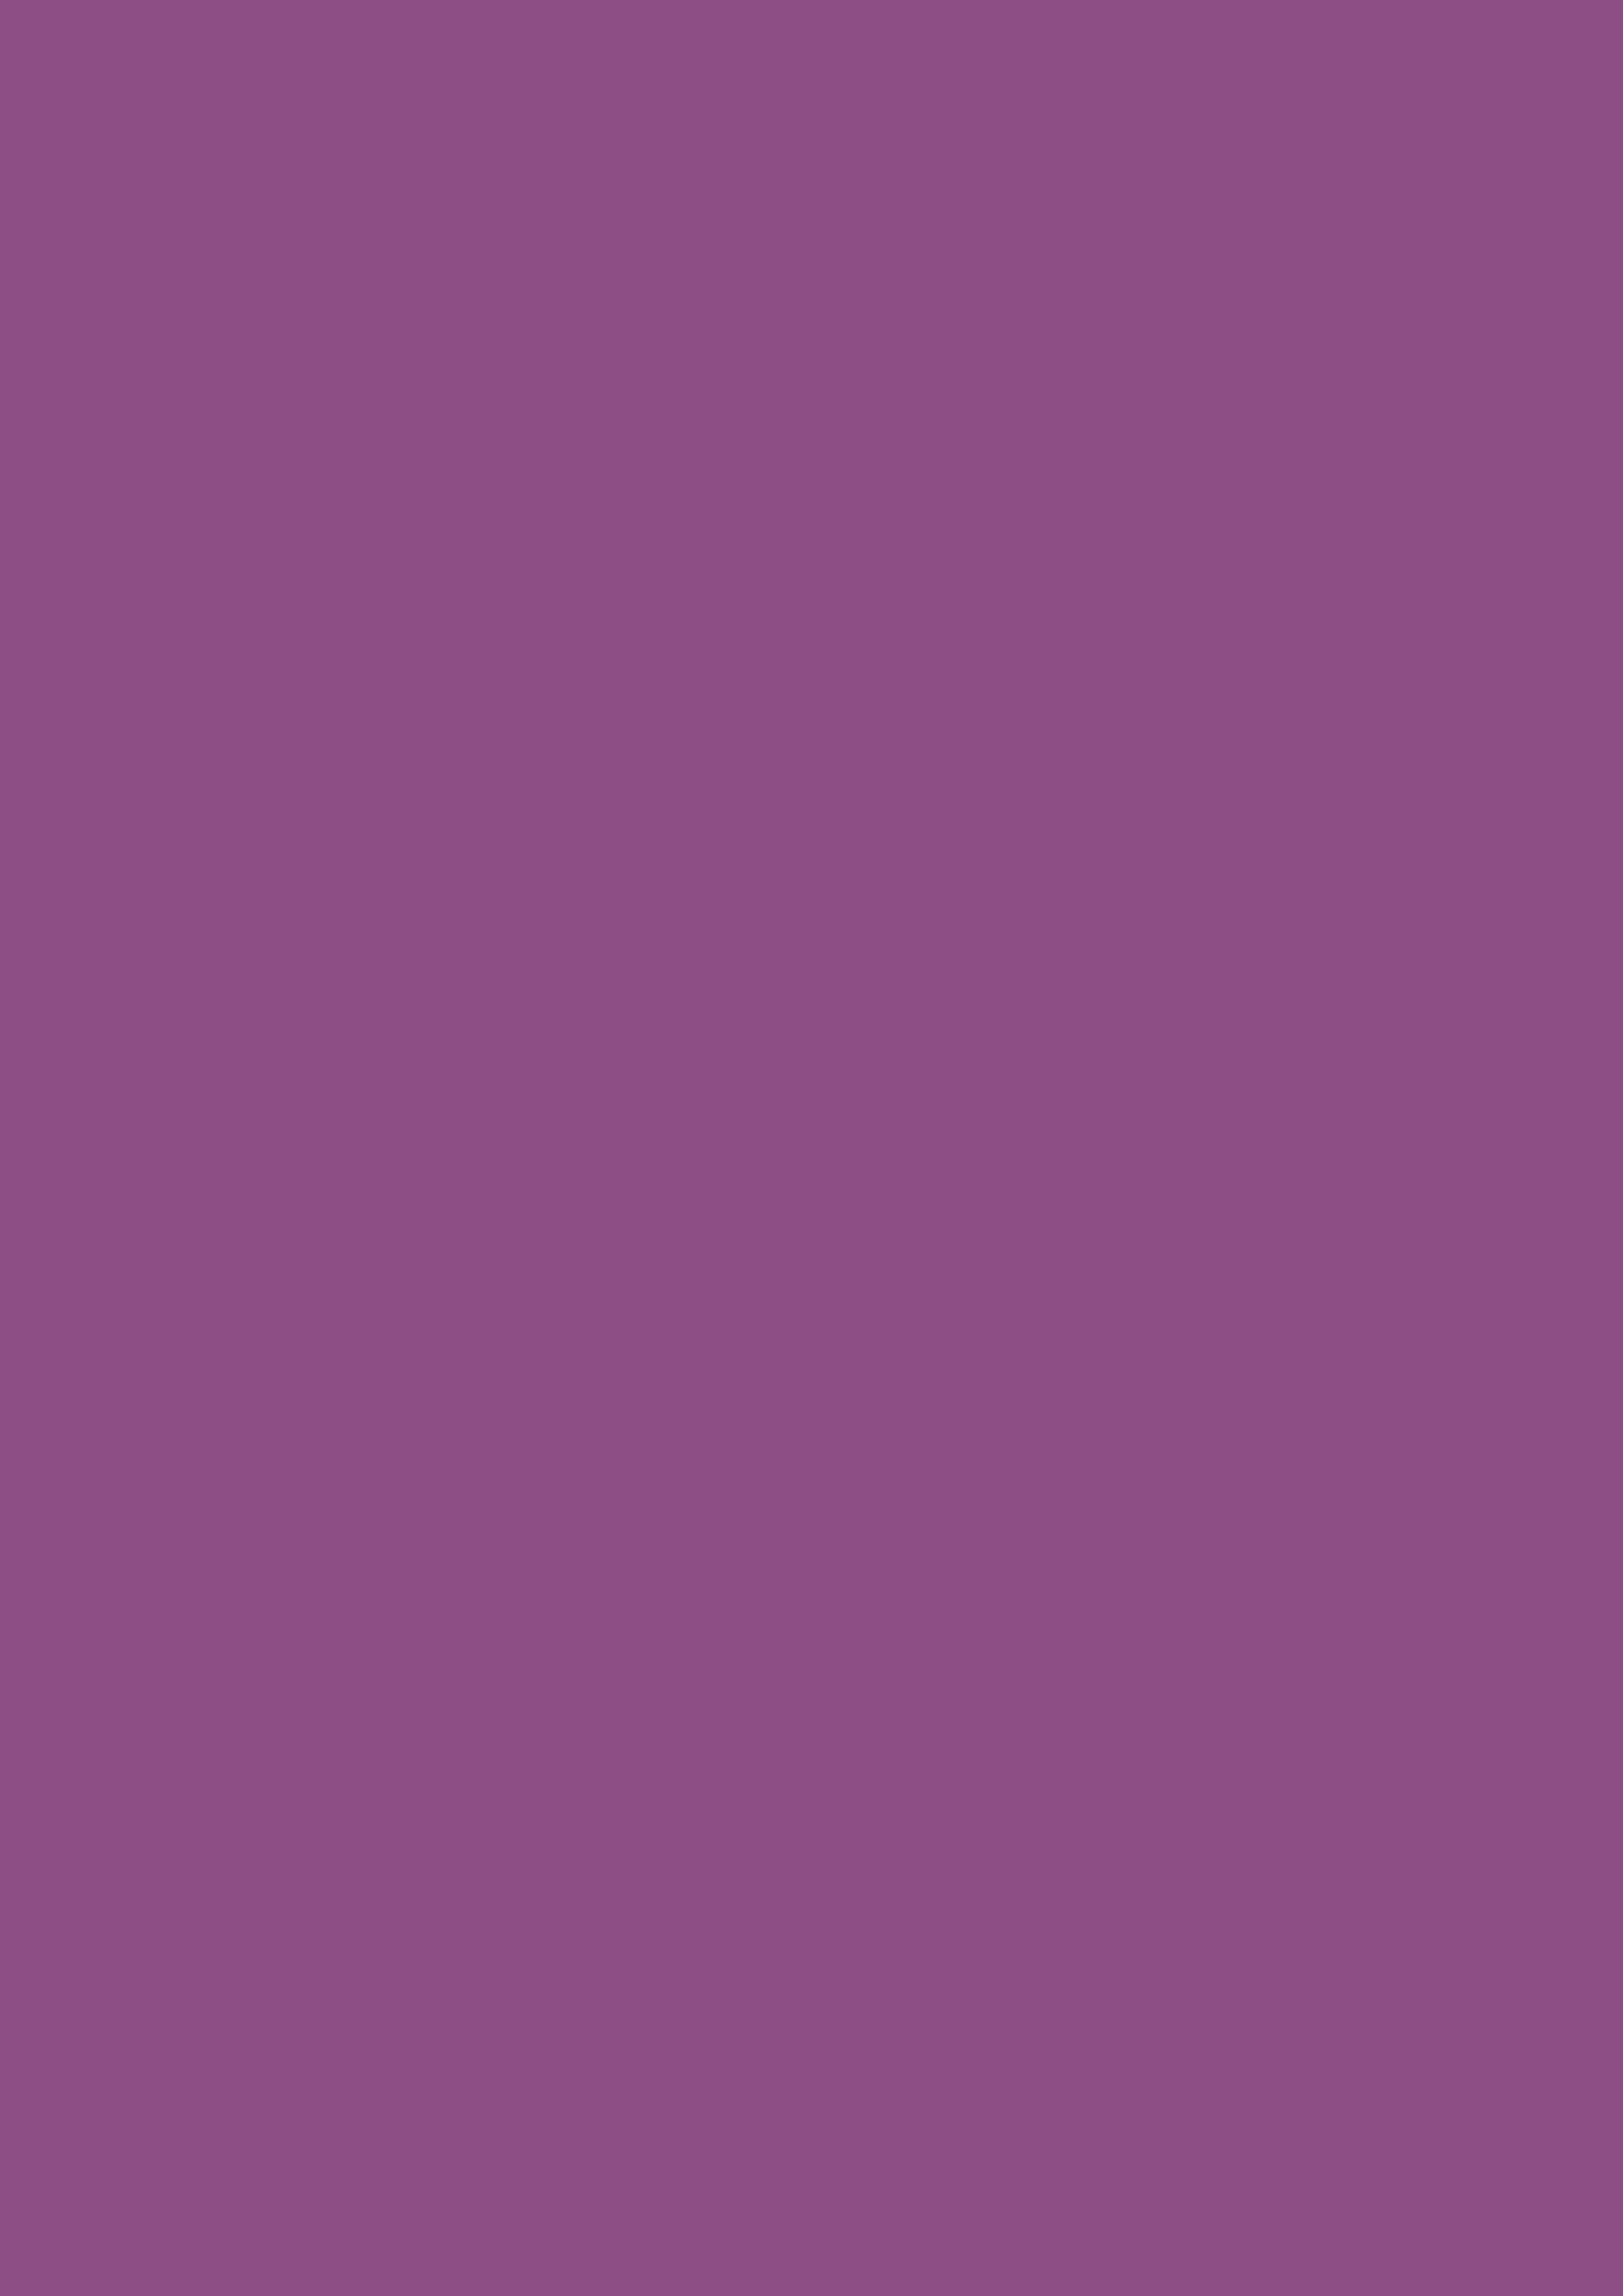 2480x3508 Razzmic Berry Solid Color Background